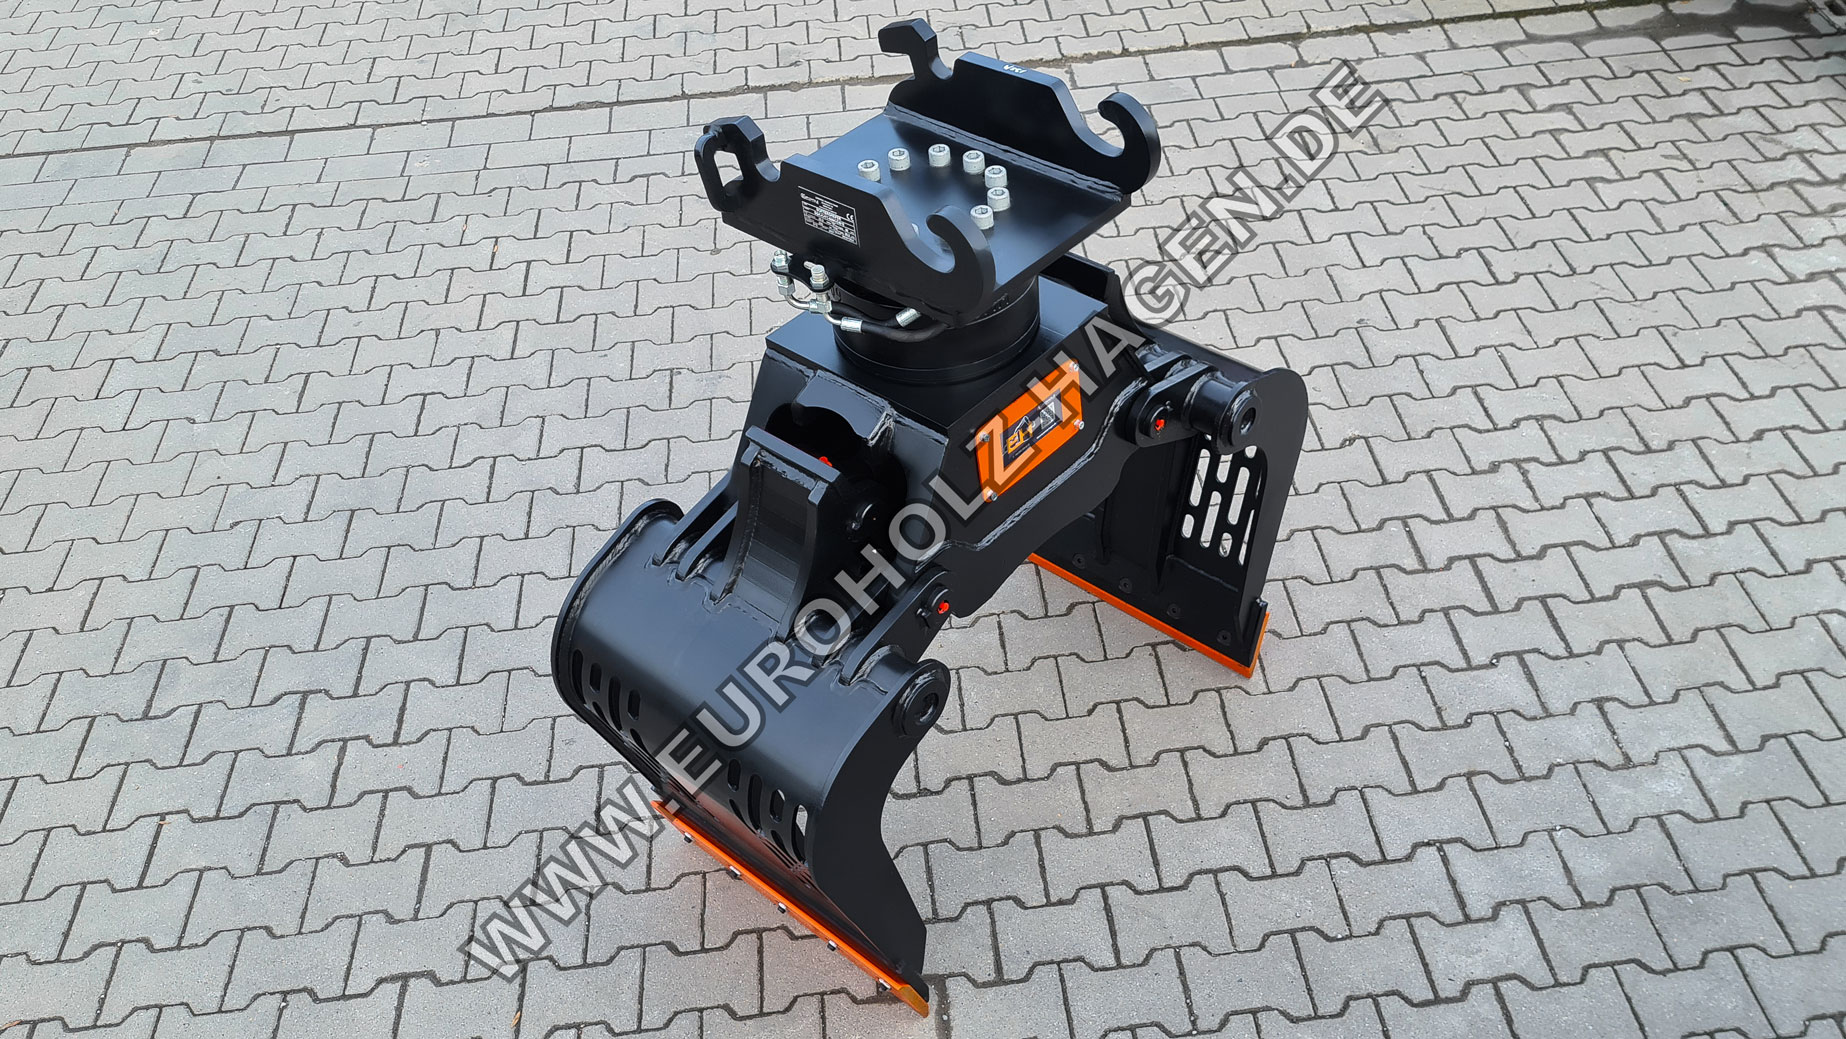 Sortiergreifer mit THUMM Rotator Typ 609H passend Verachtert CW10 Kat. 3